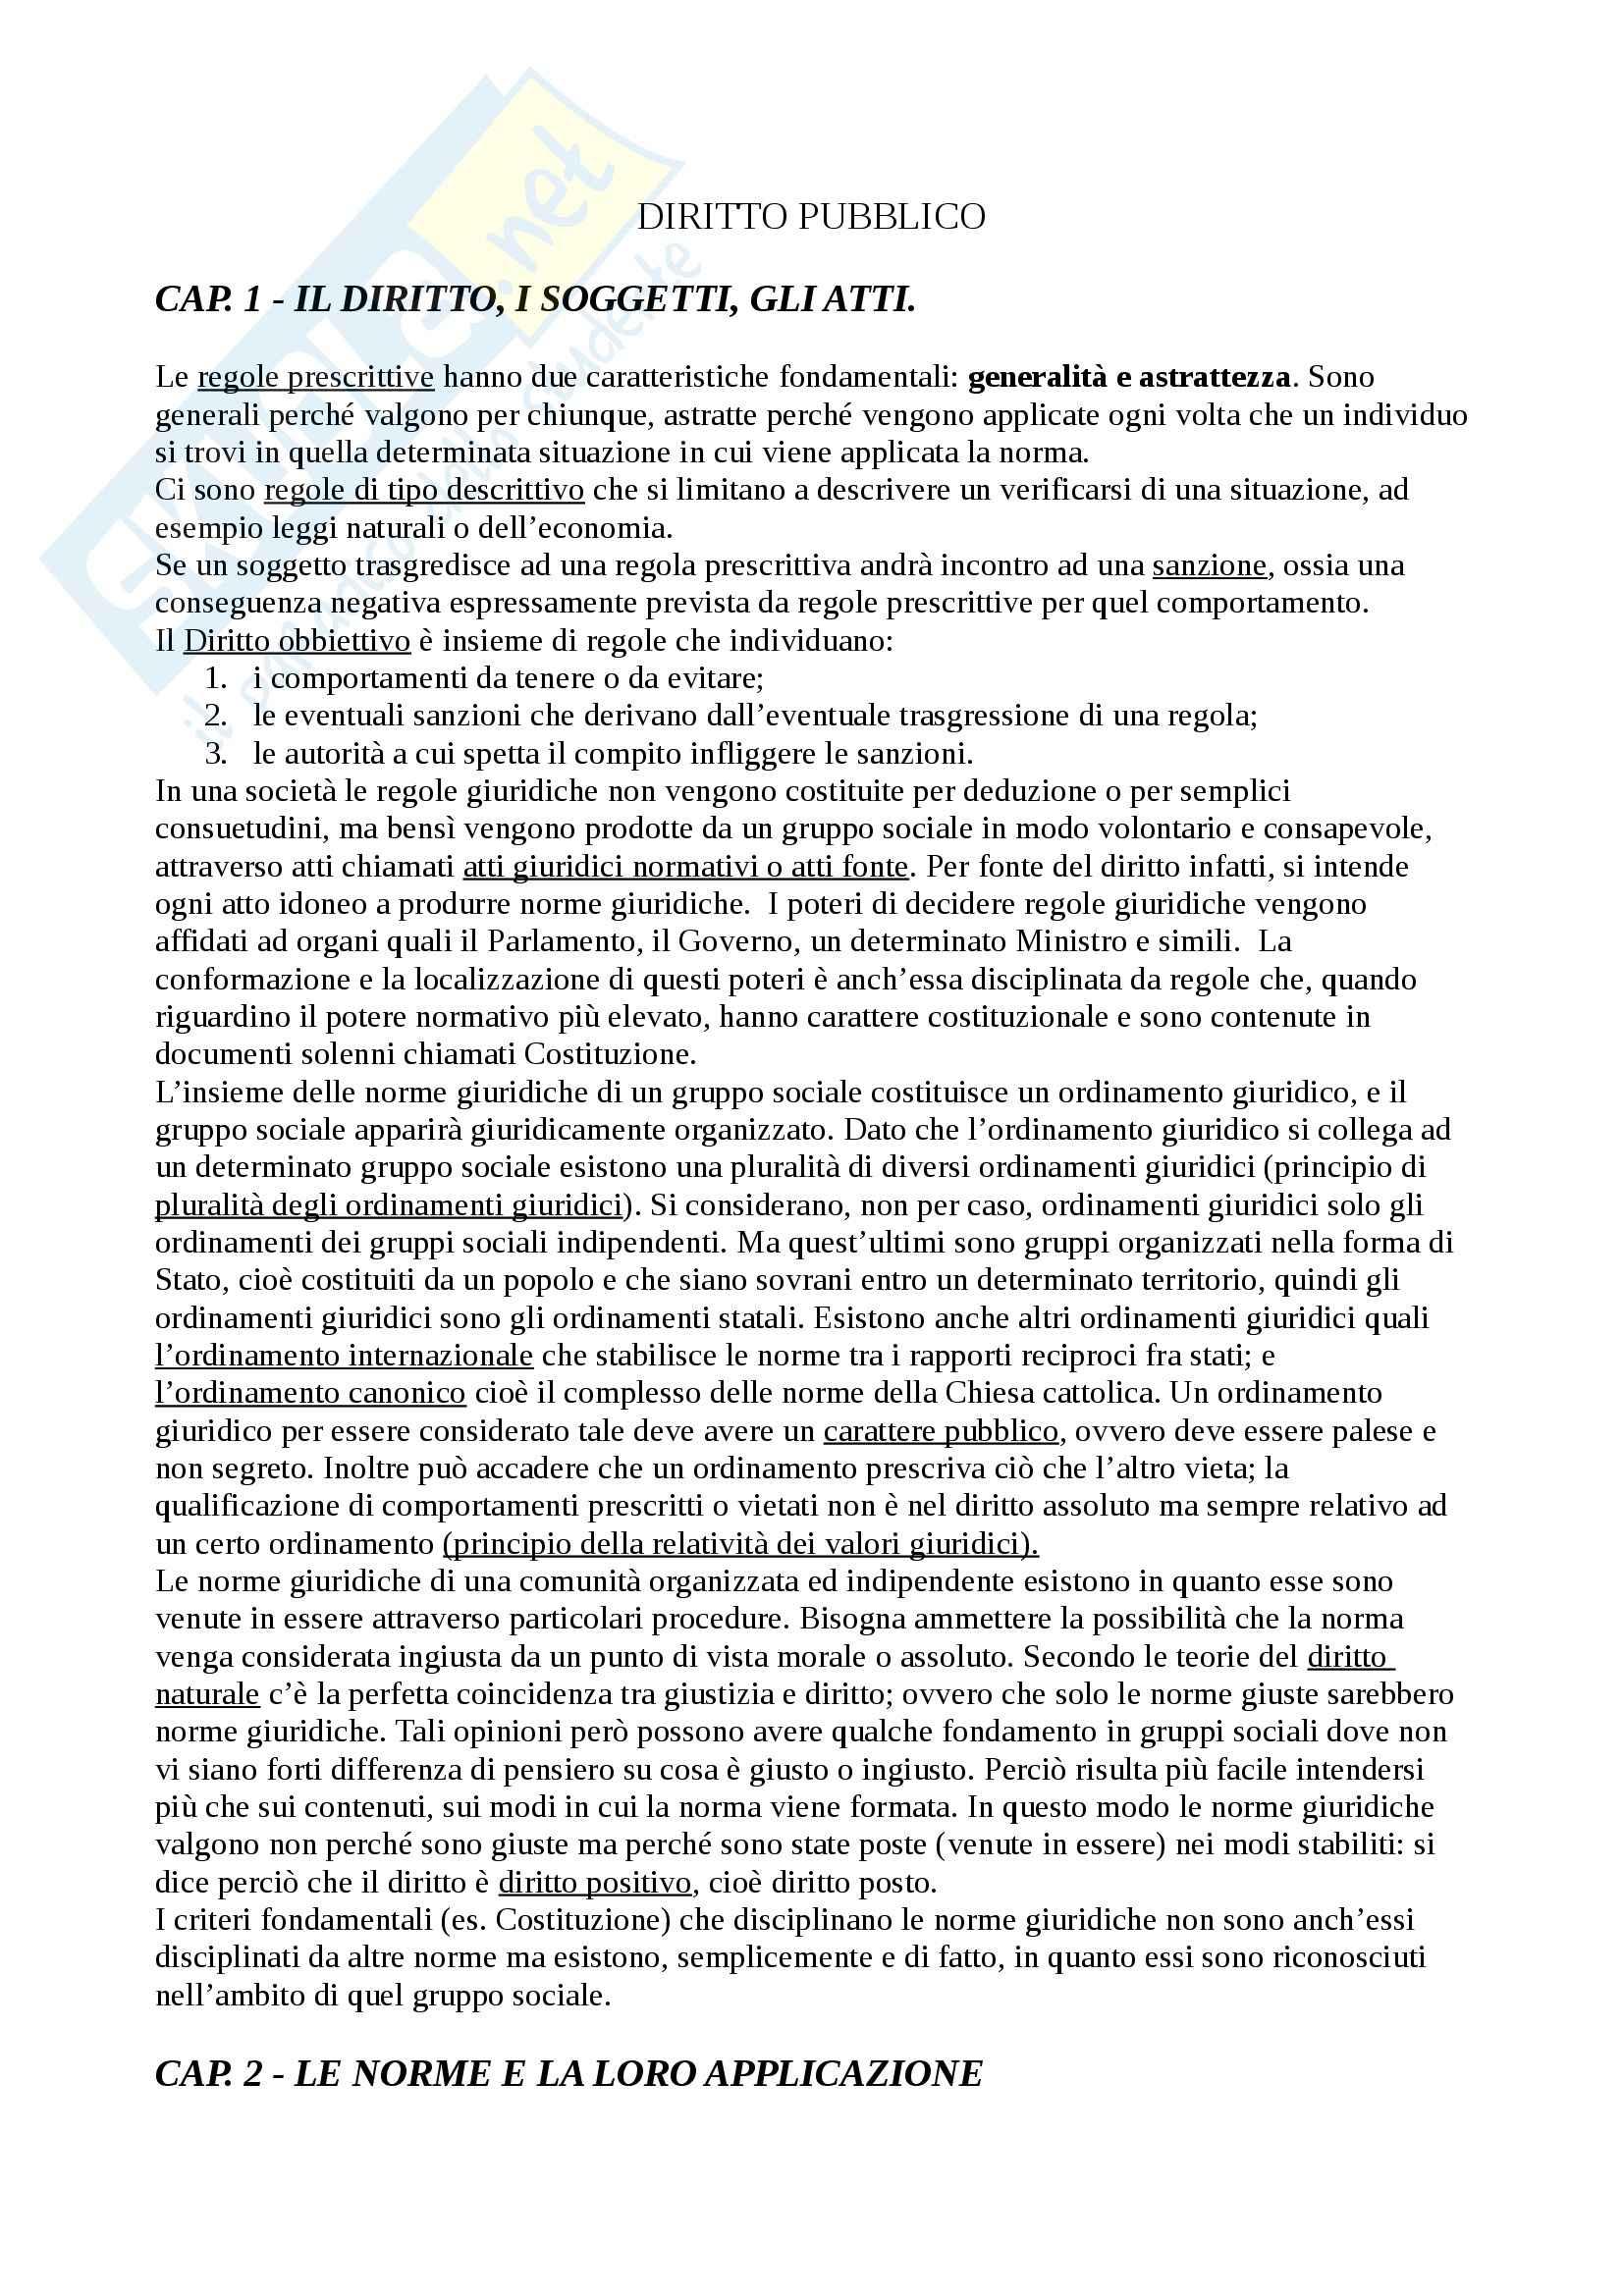 Riassunto esame Diritto pubblico, prof. Monego